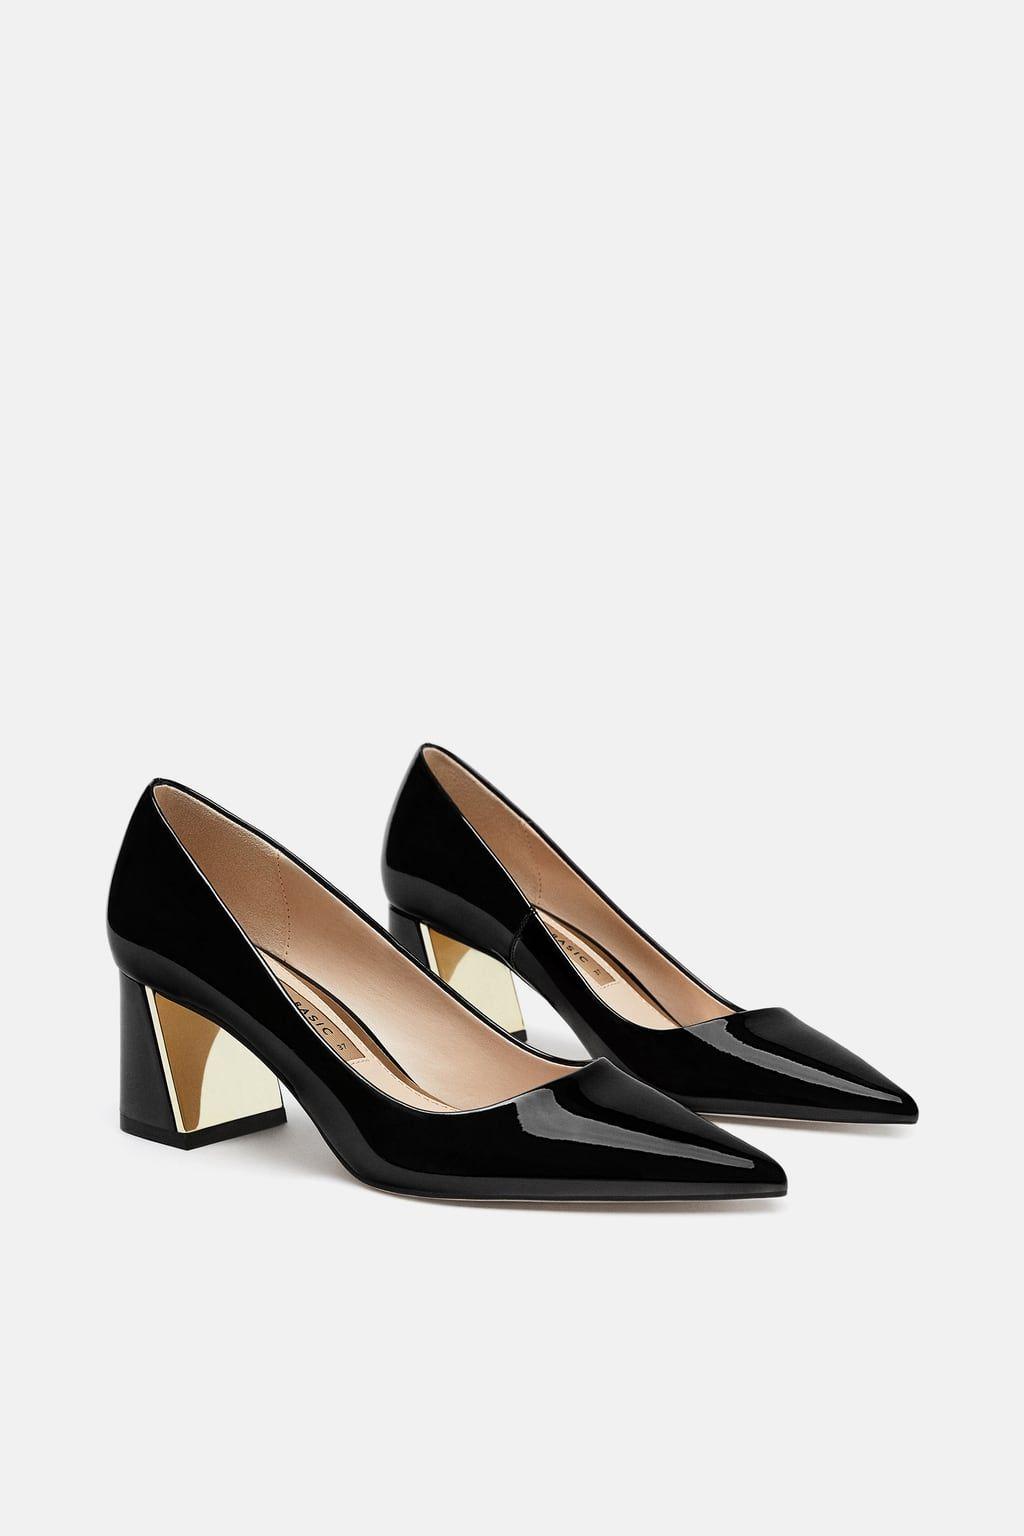 Negra Tacon De Zapatos Zara Mujer Ancho Excelente Primavera